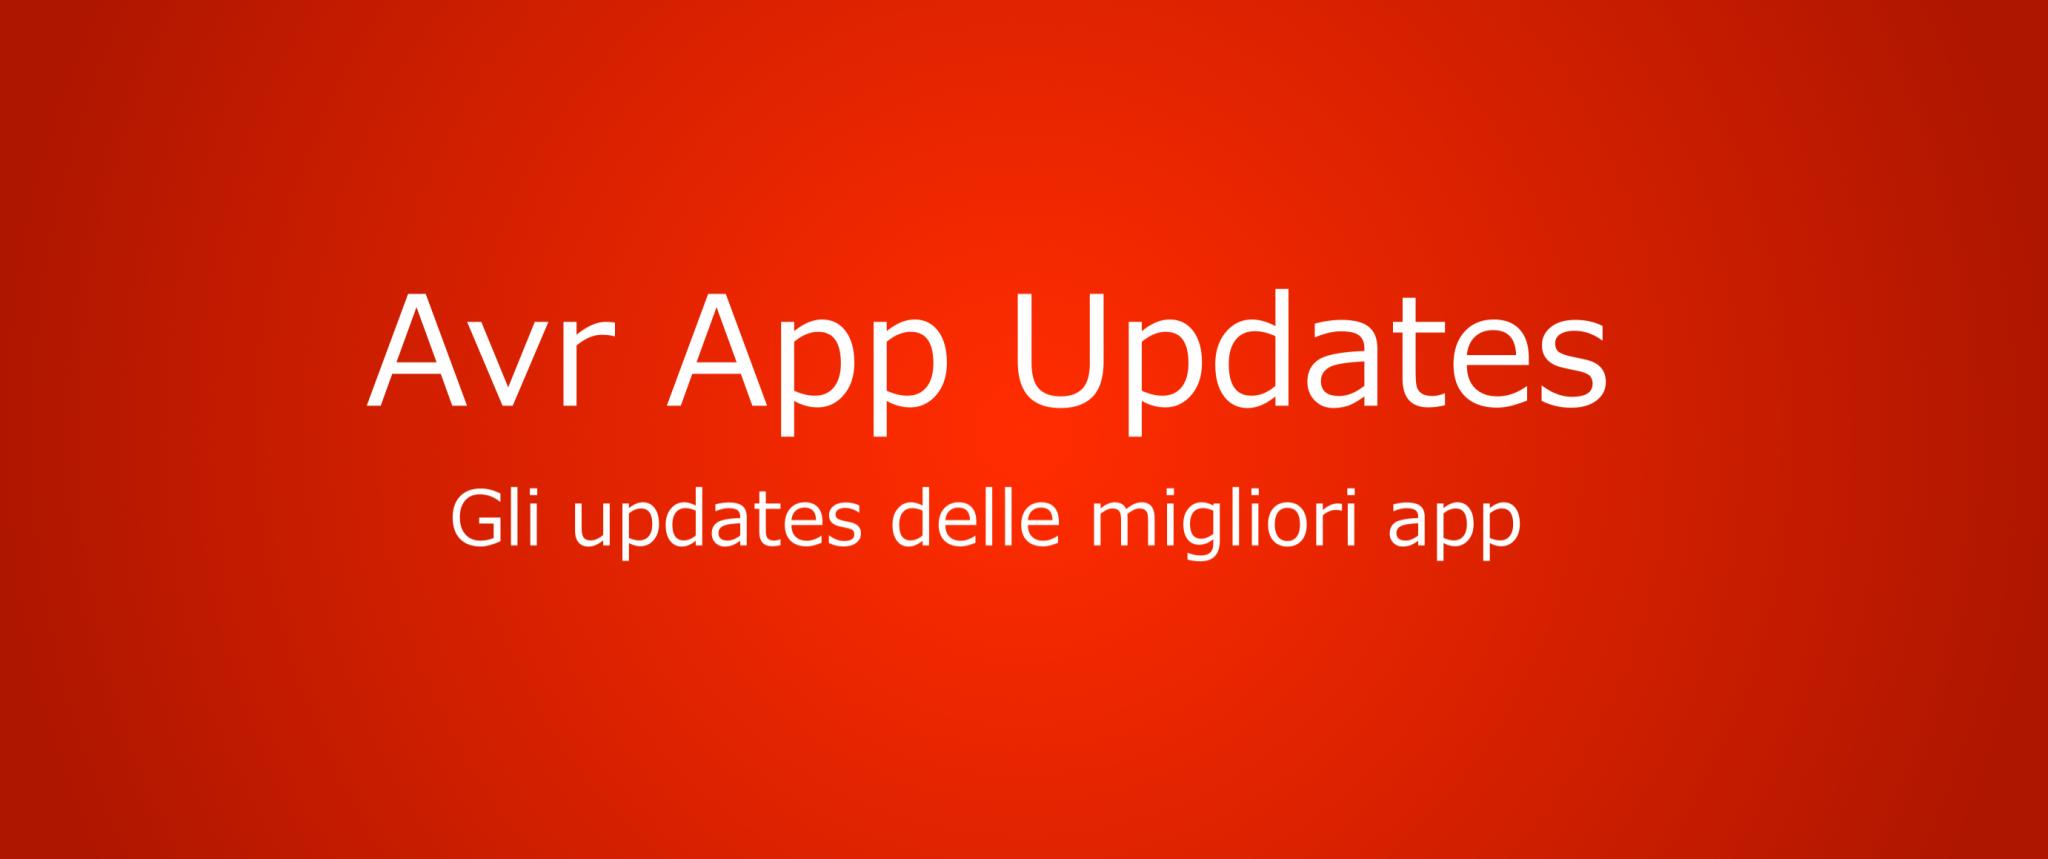 avr-app-updates-avrmagazine